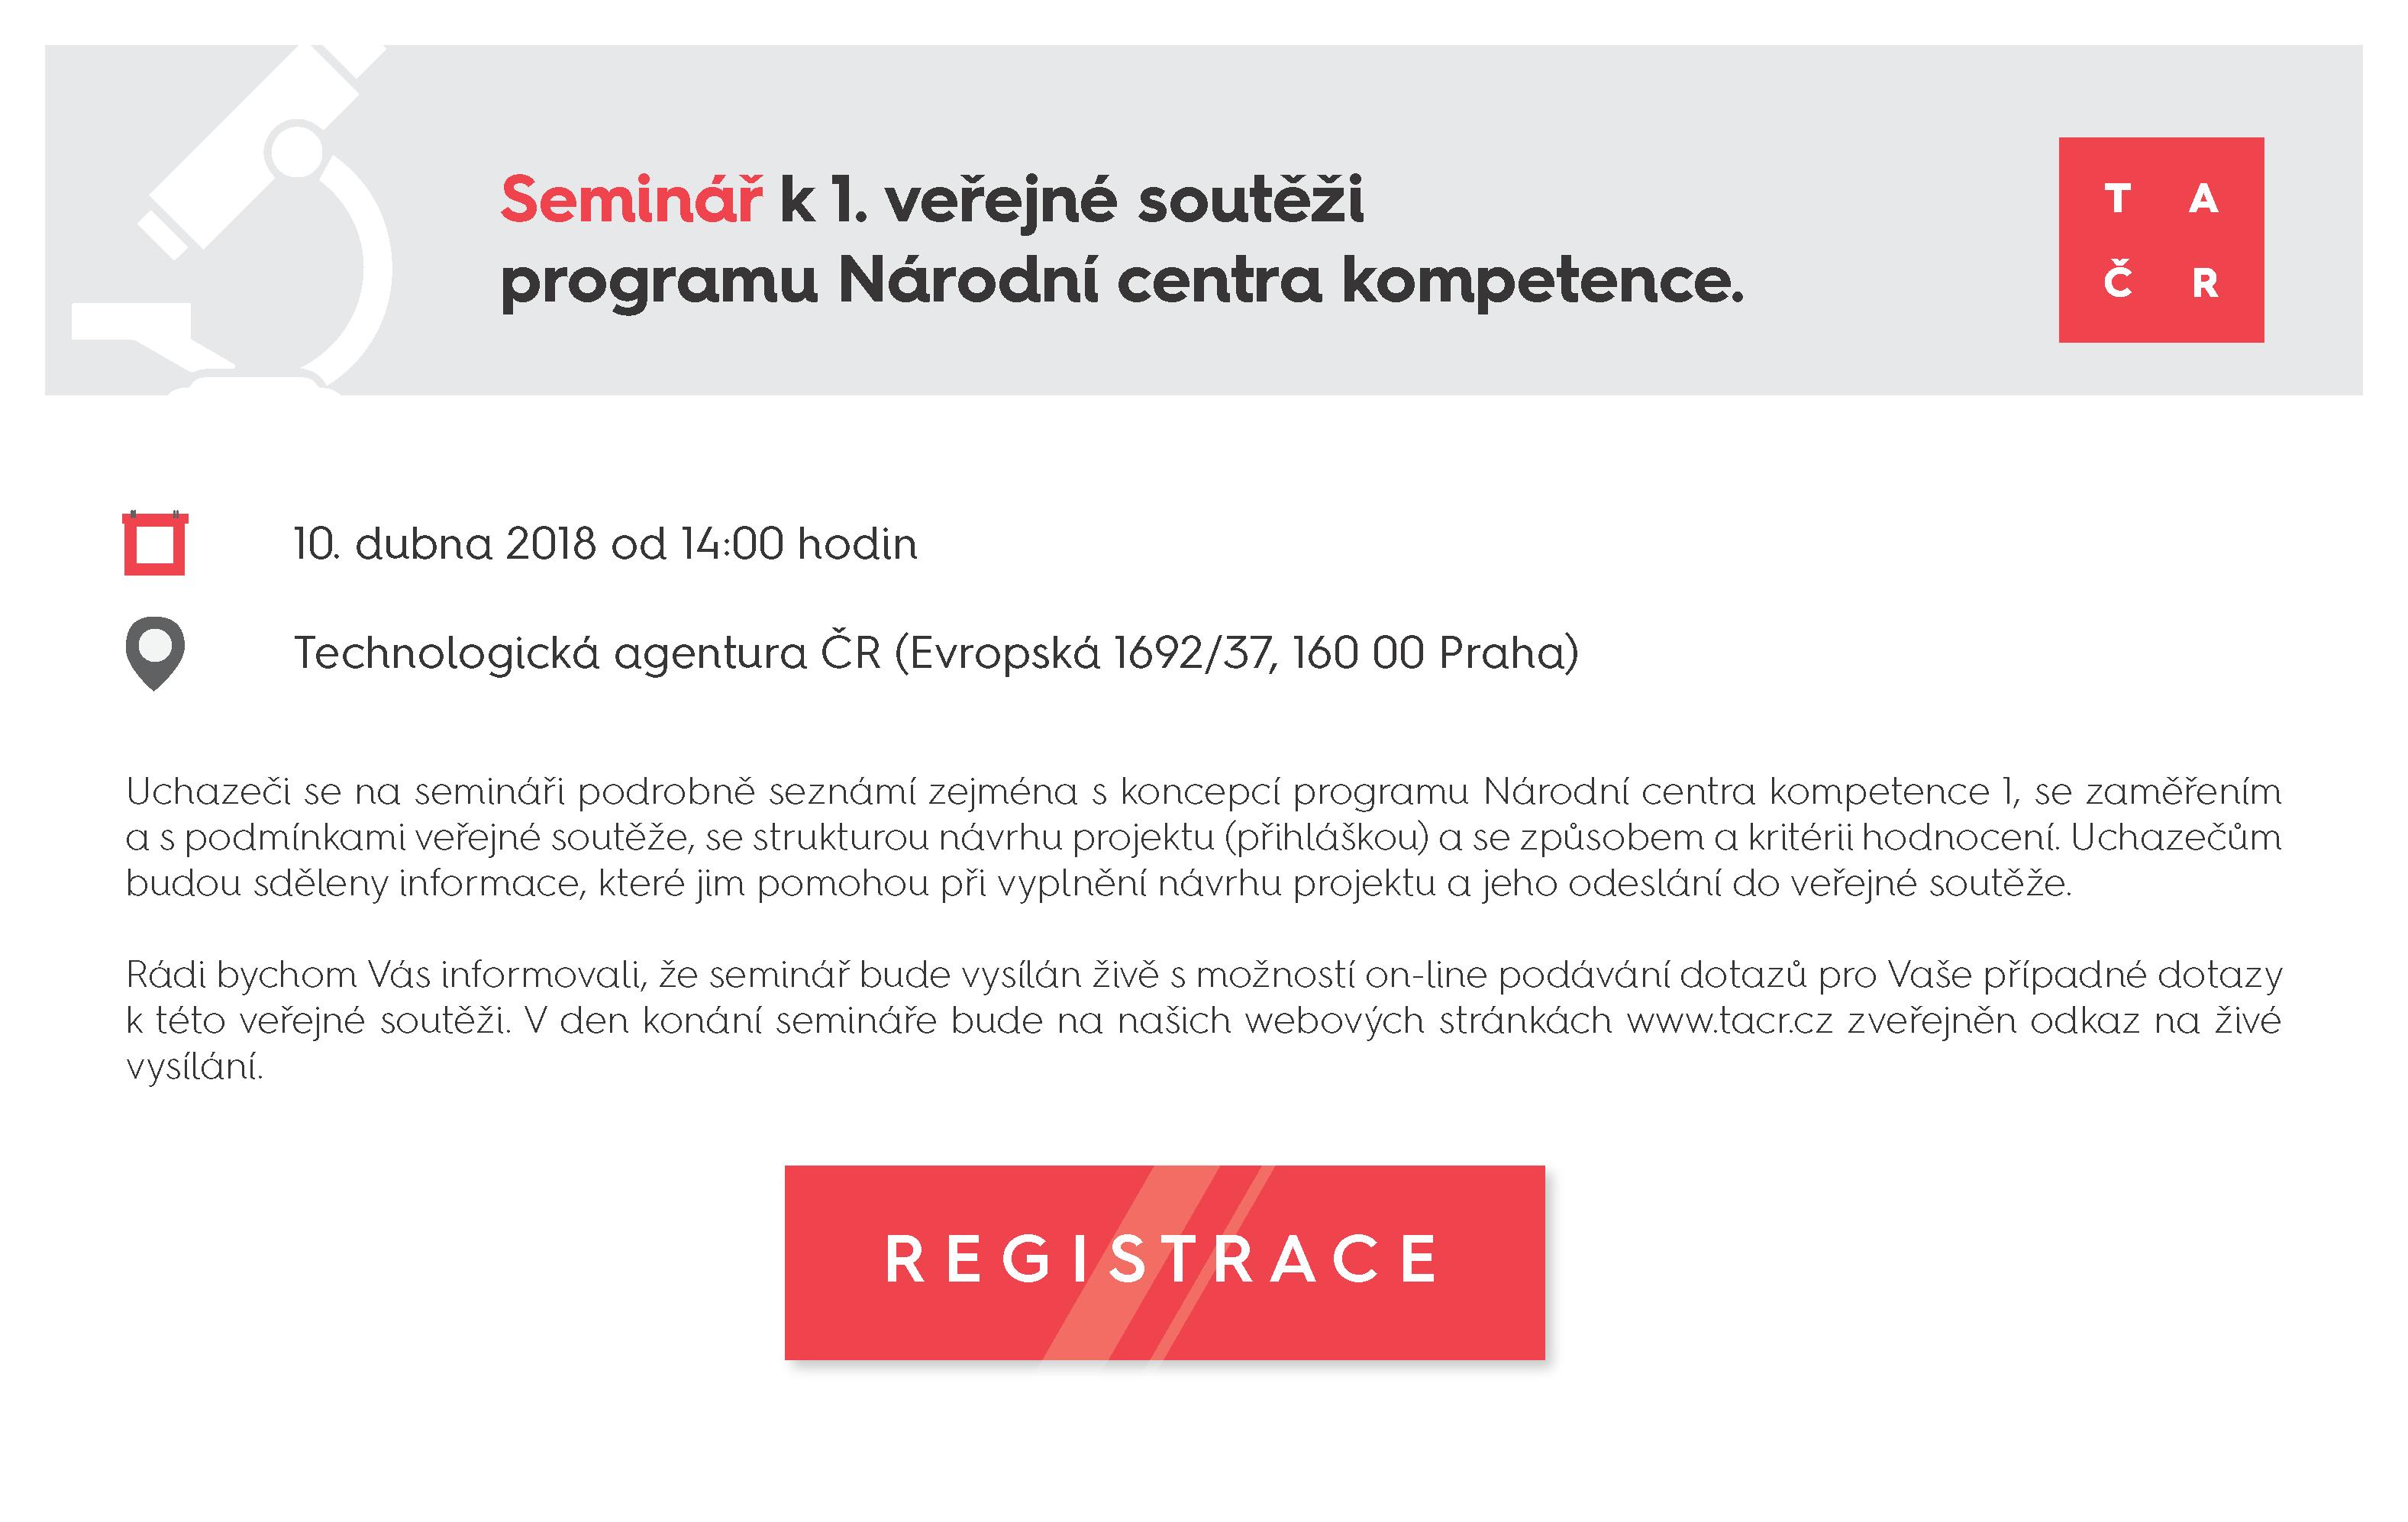 NCK registrace 2